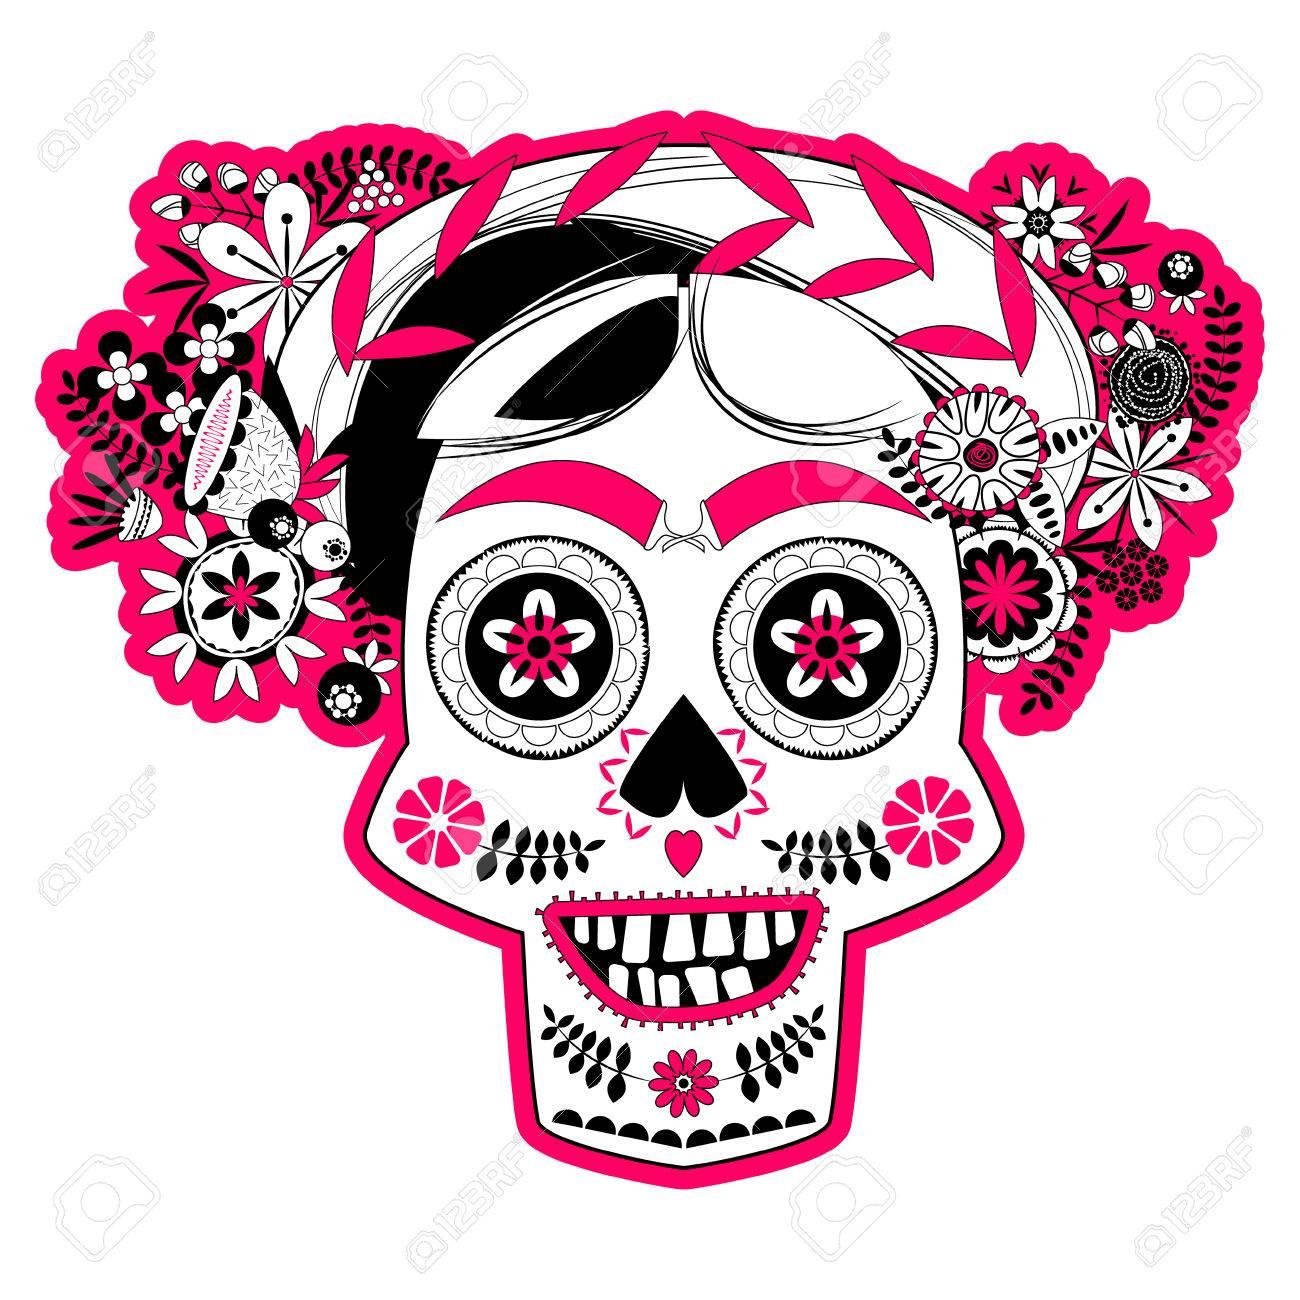 Smiling Skull With A Flower Decorated Hairdo La Calavera Catrina